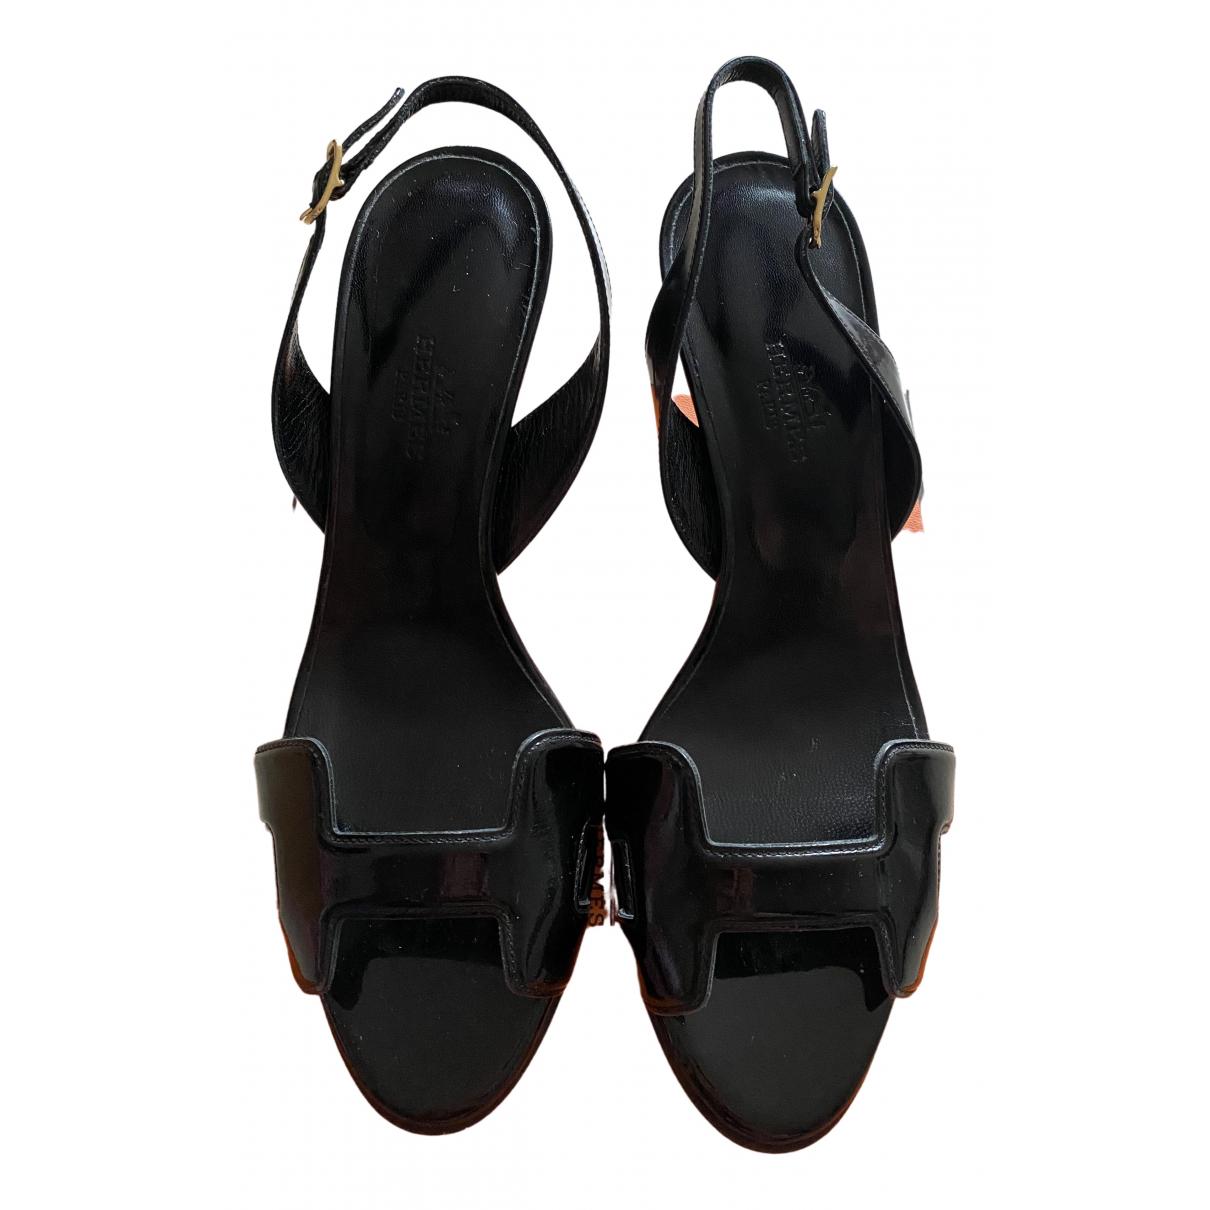 Hermès Night Black Leather Sandals for Women 36 EU